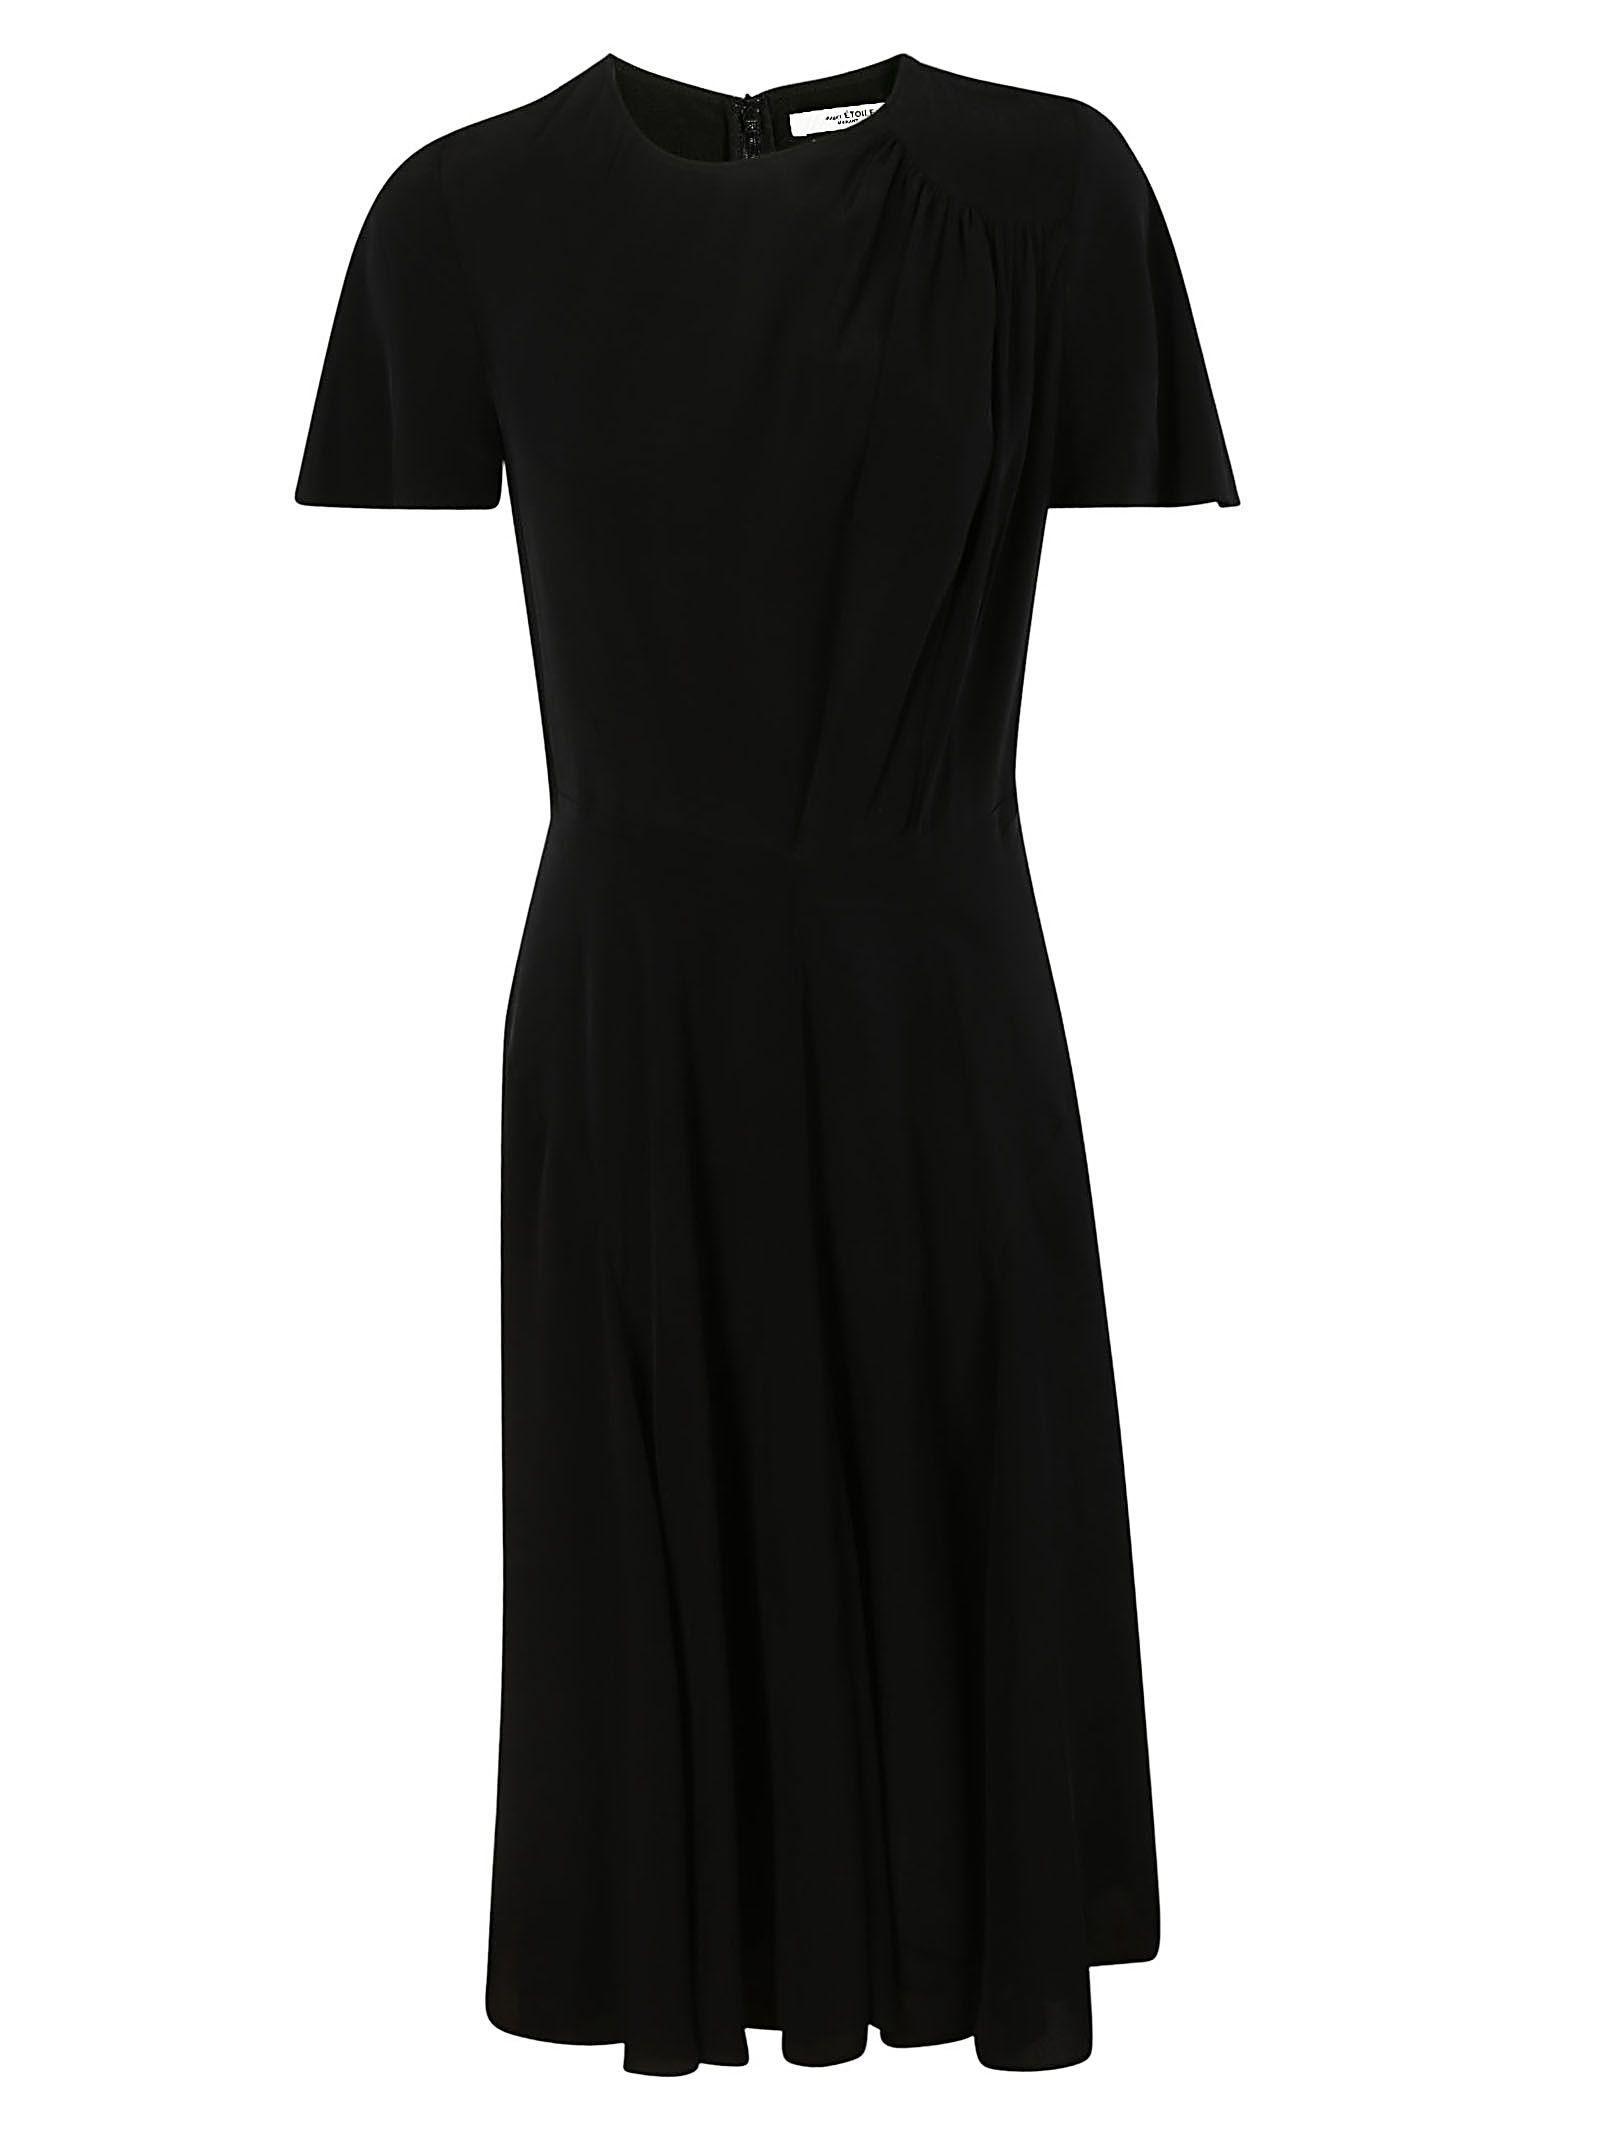 251f763f7b9 Etoile Isabel Marant Isabel Marant ÉToile Lexia Dress In Black ...